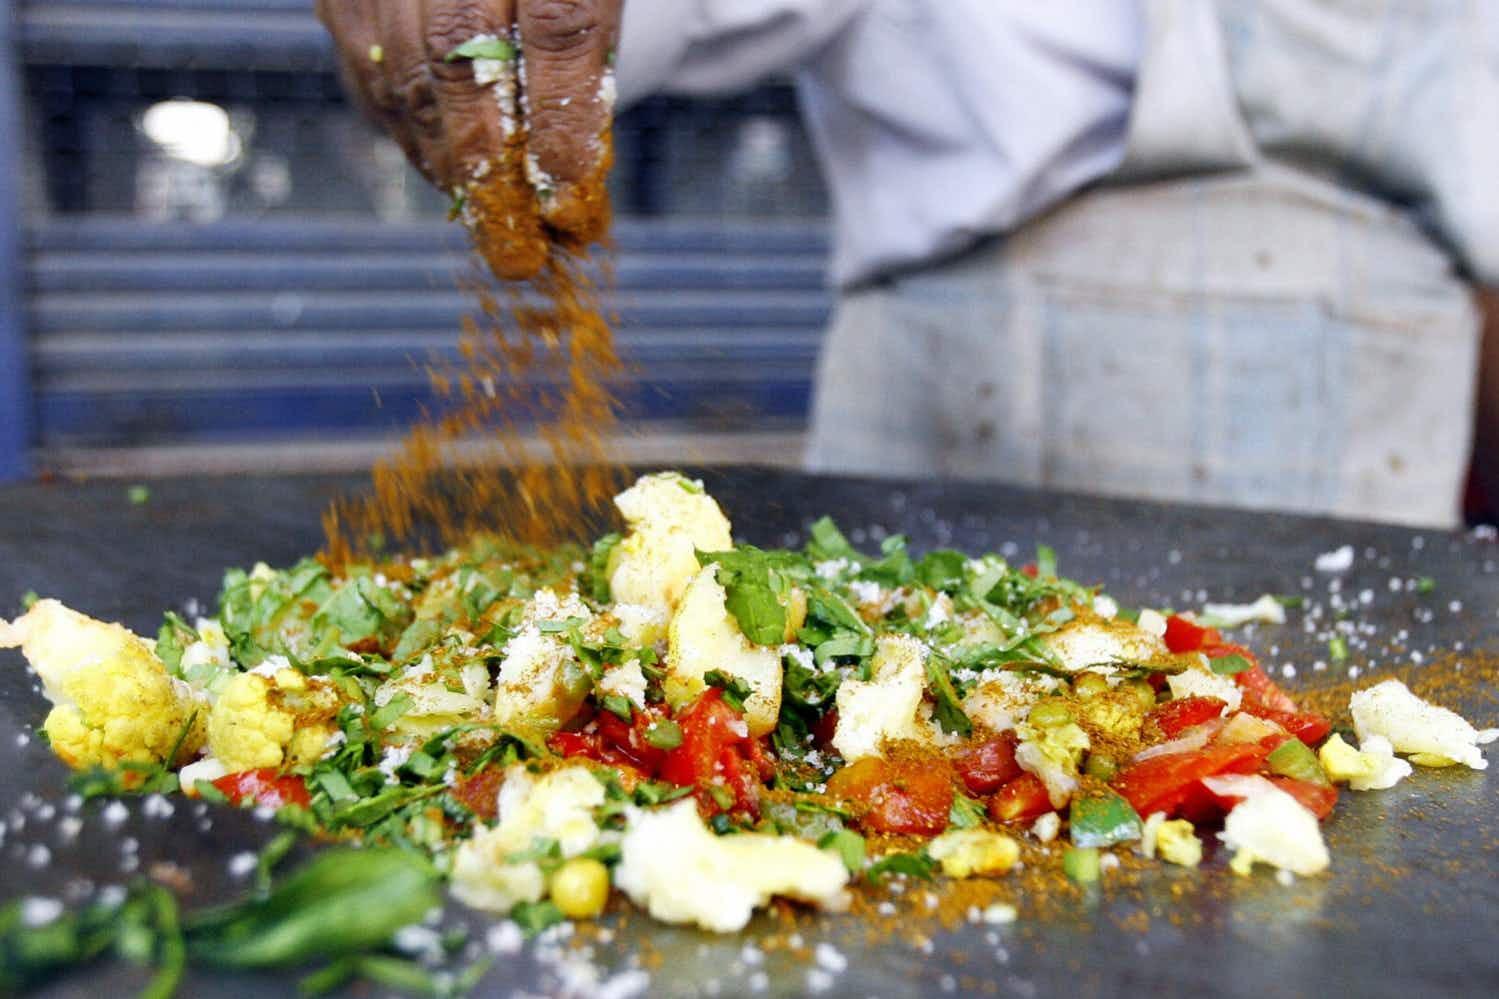 Over half of Singapore's Bib Gourmand recipients are hawker stalls